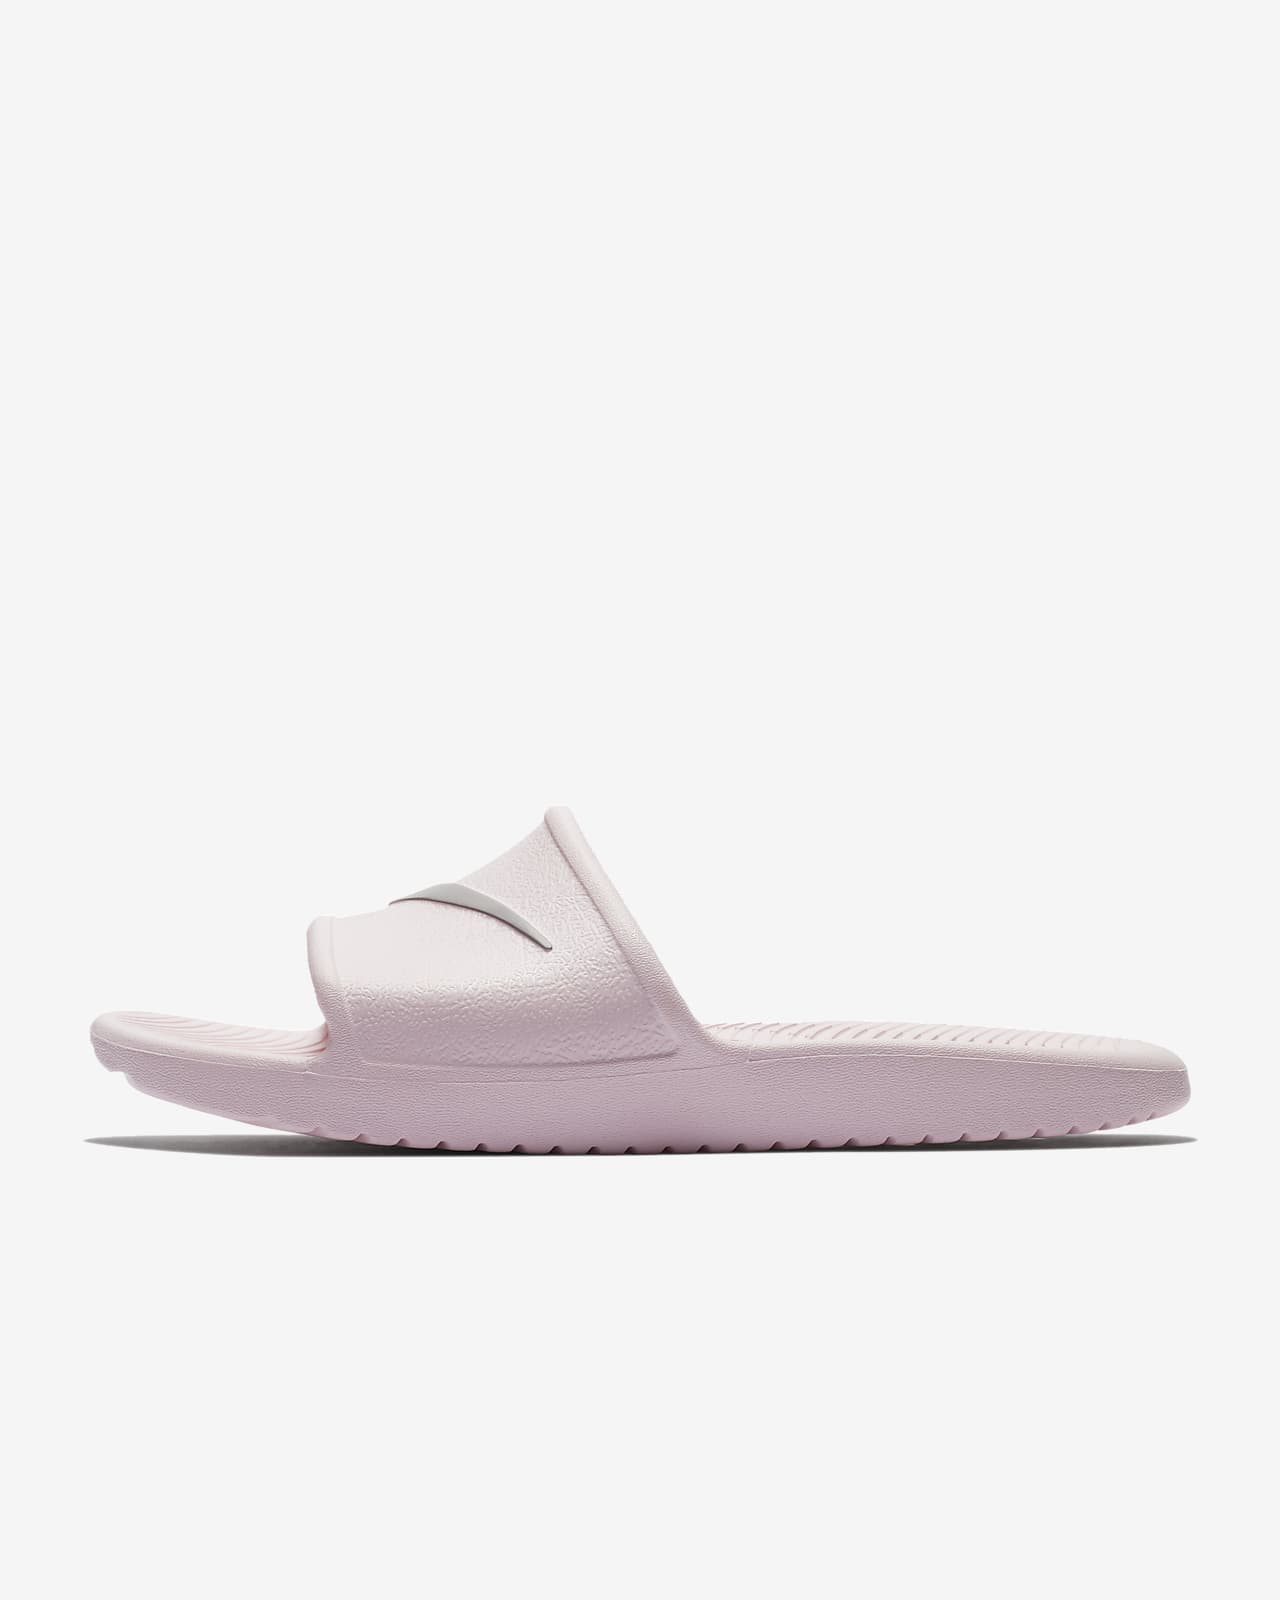 Nike Kawa Women's Slide. Nike CH